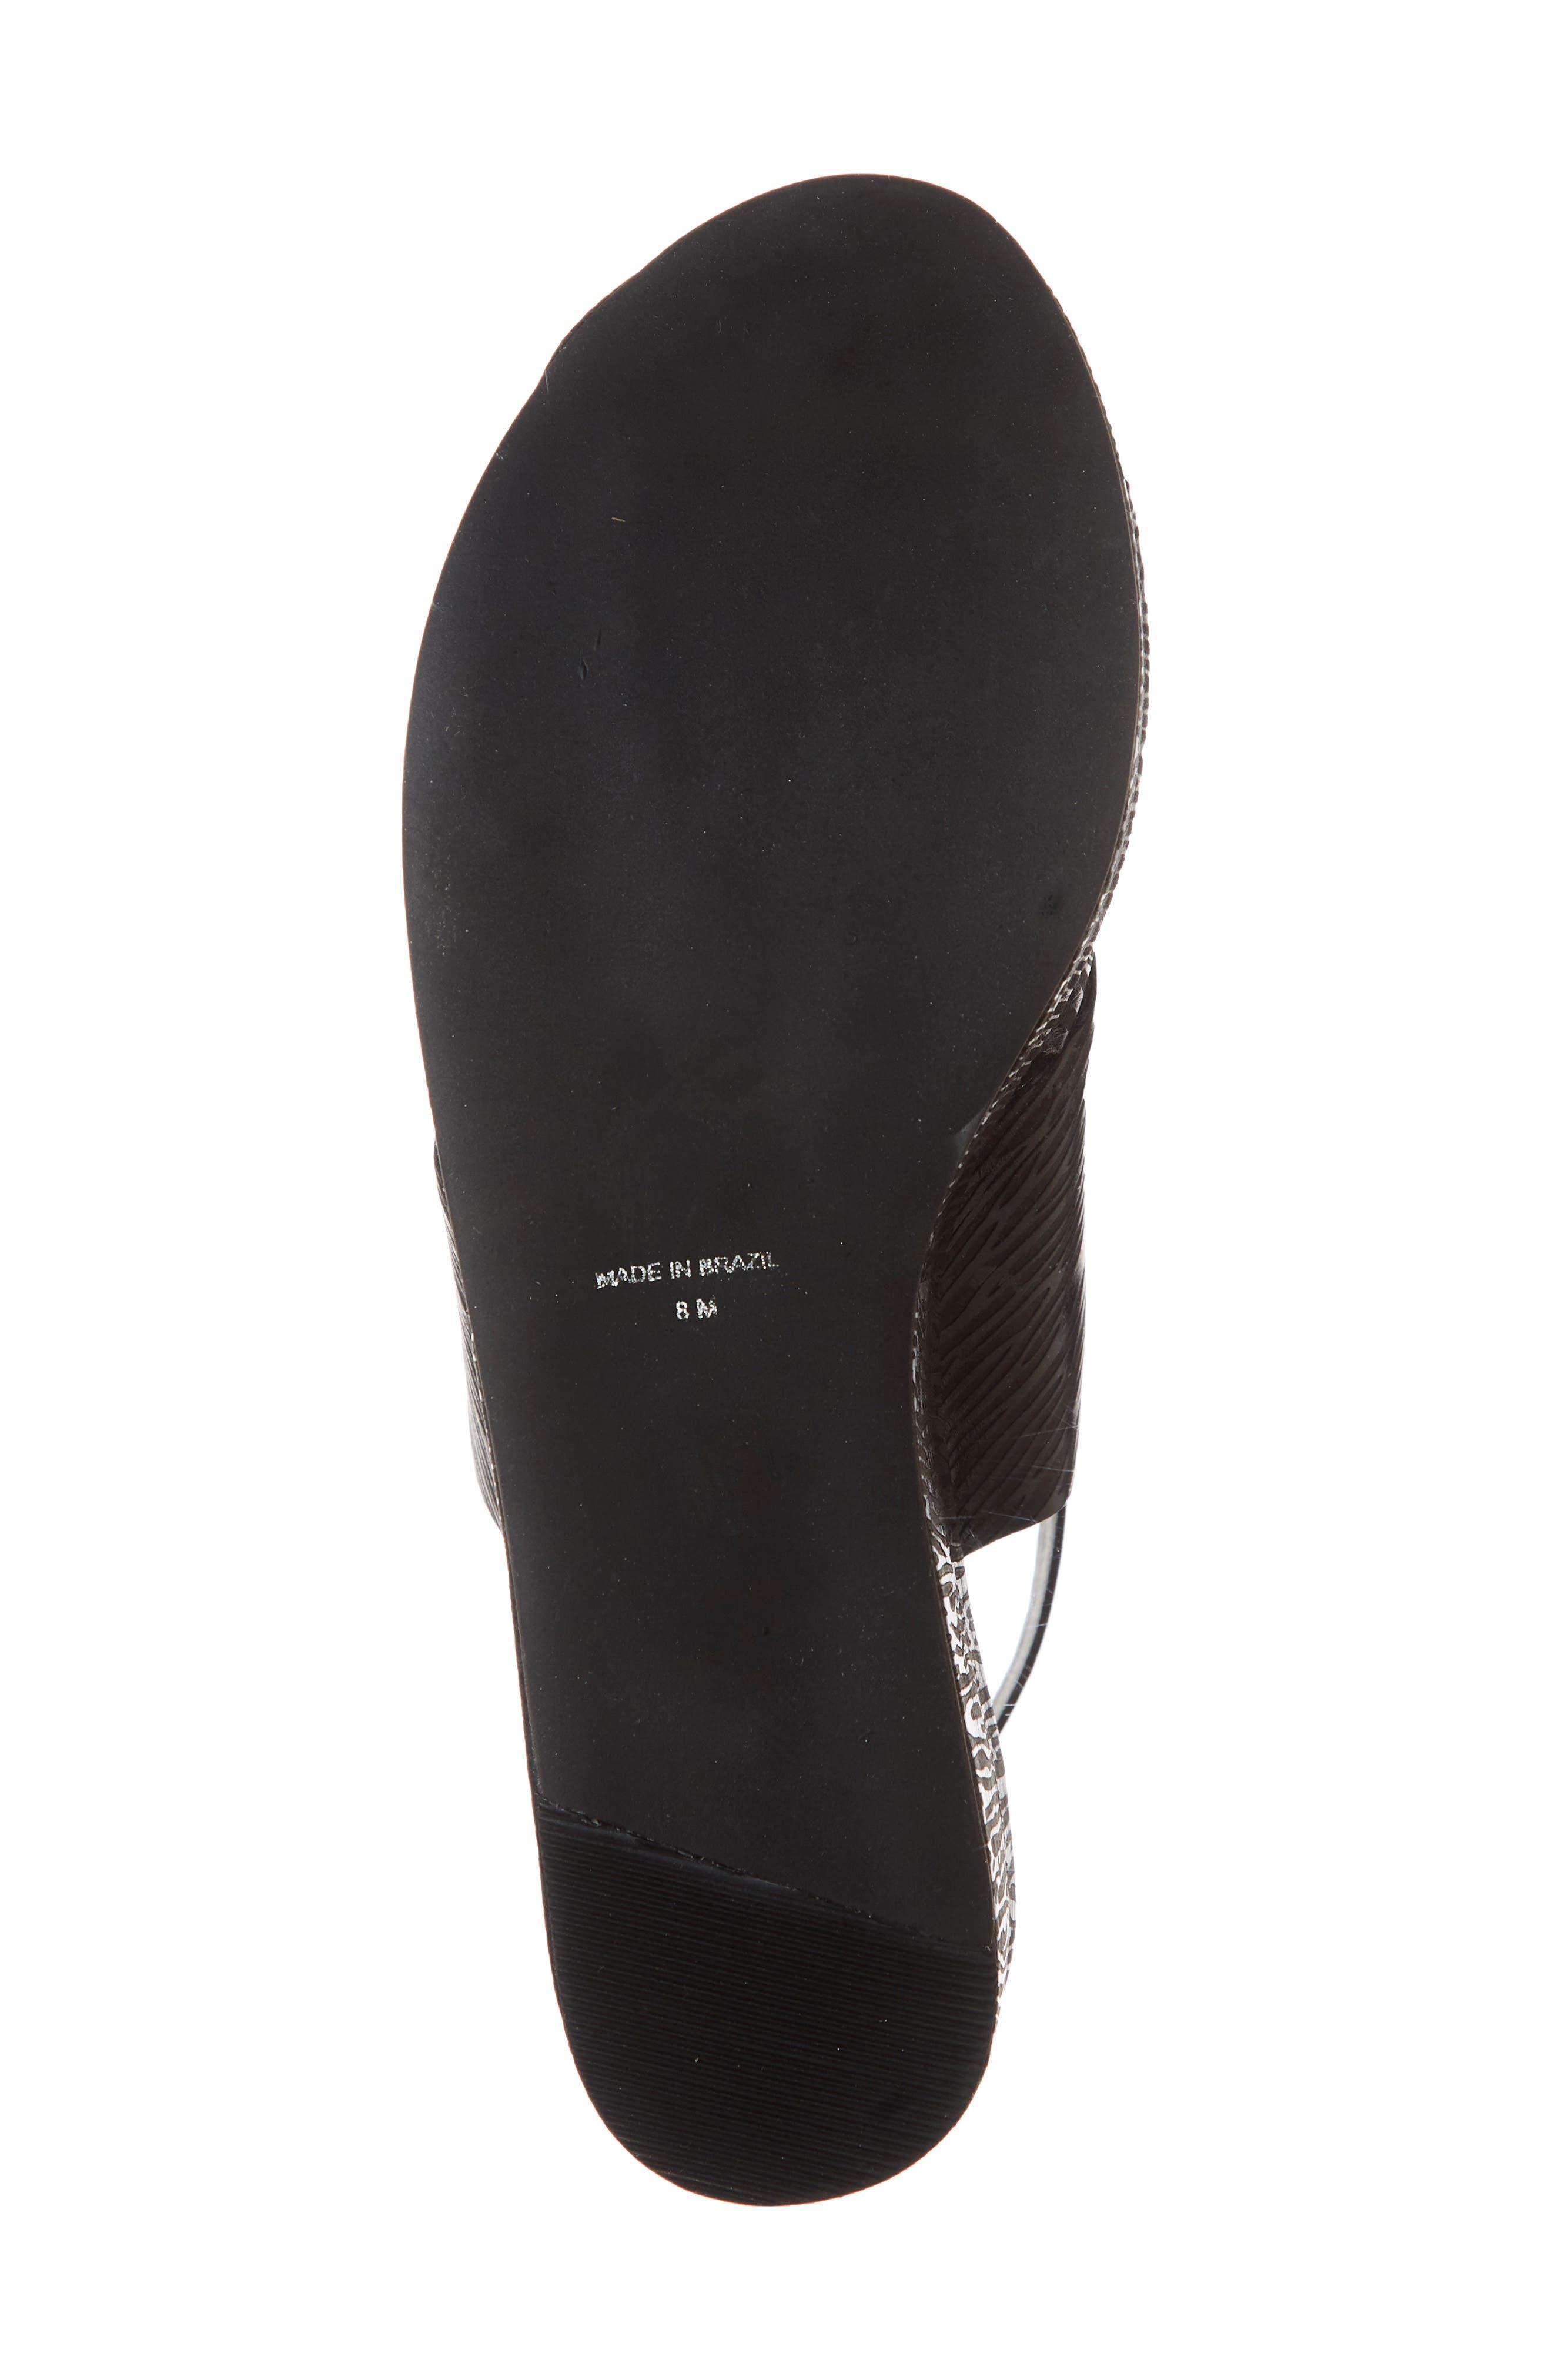 Runaway Wedge Sandal,                             Alternate thumbnail 6, color,                             BLACK LIZARD PRINT LEATHER